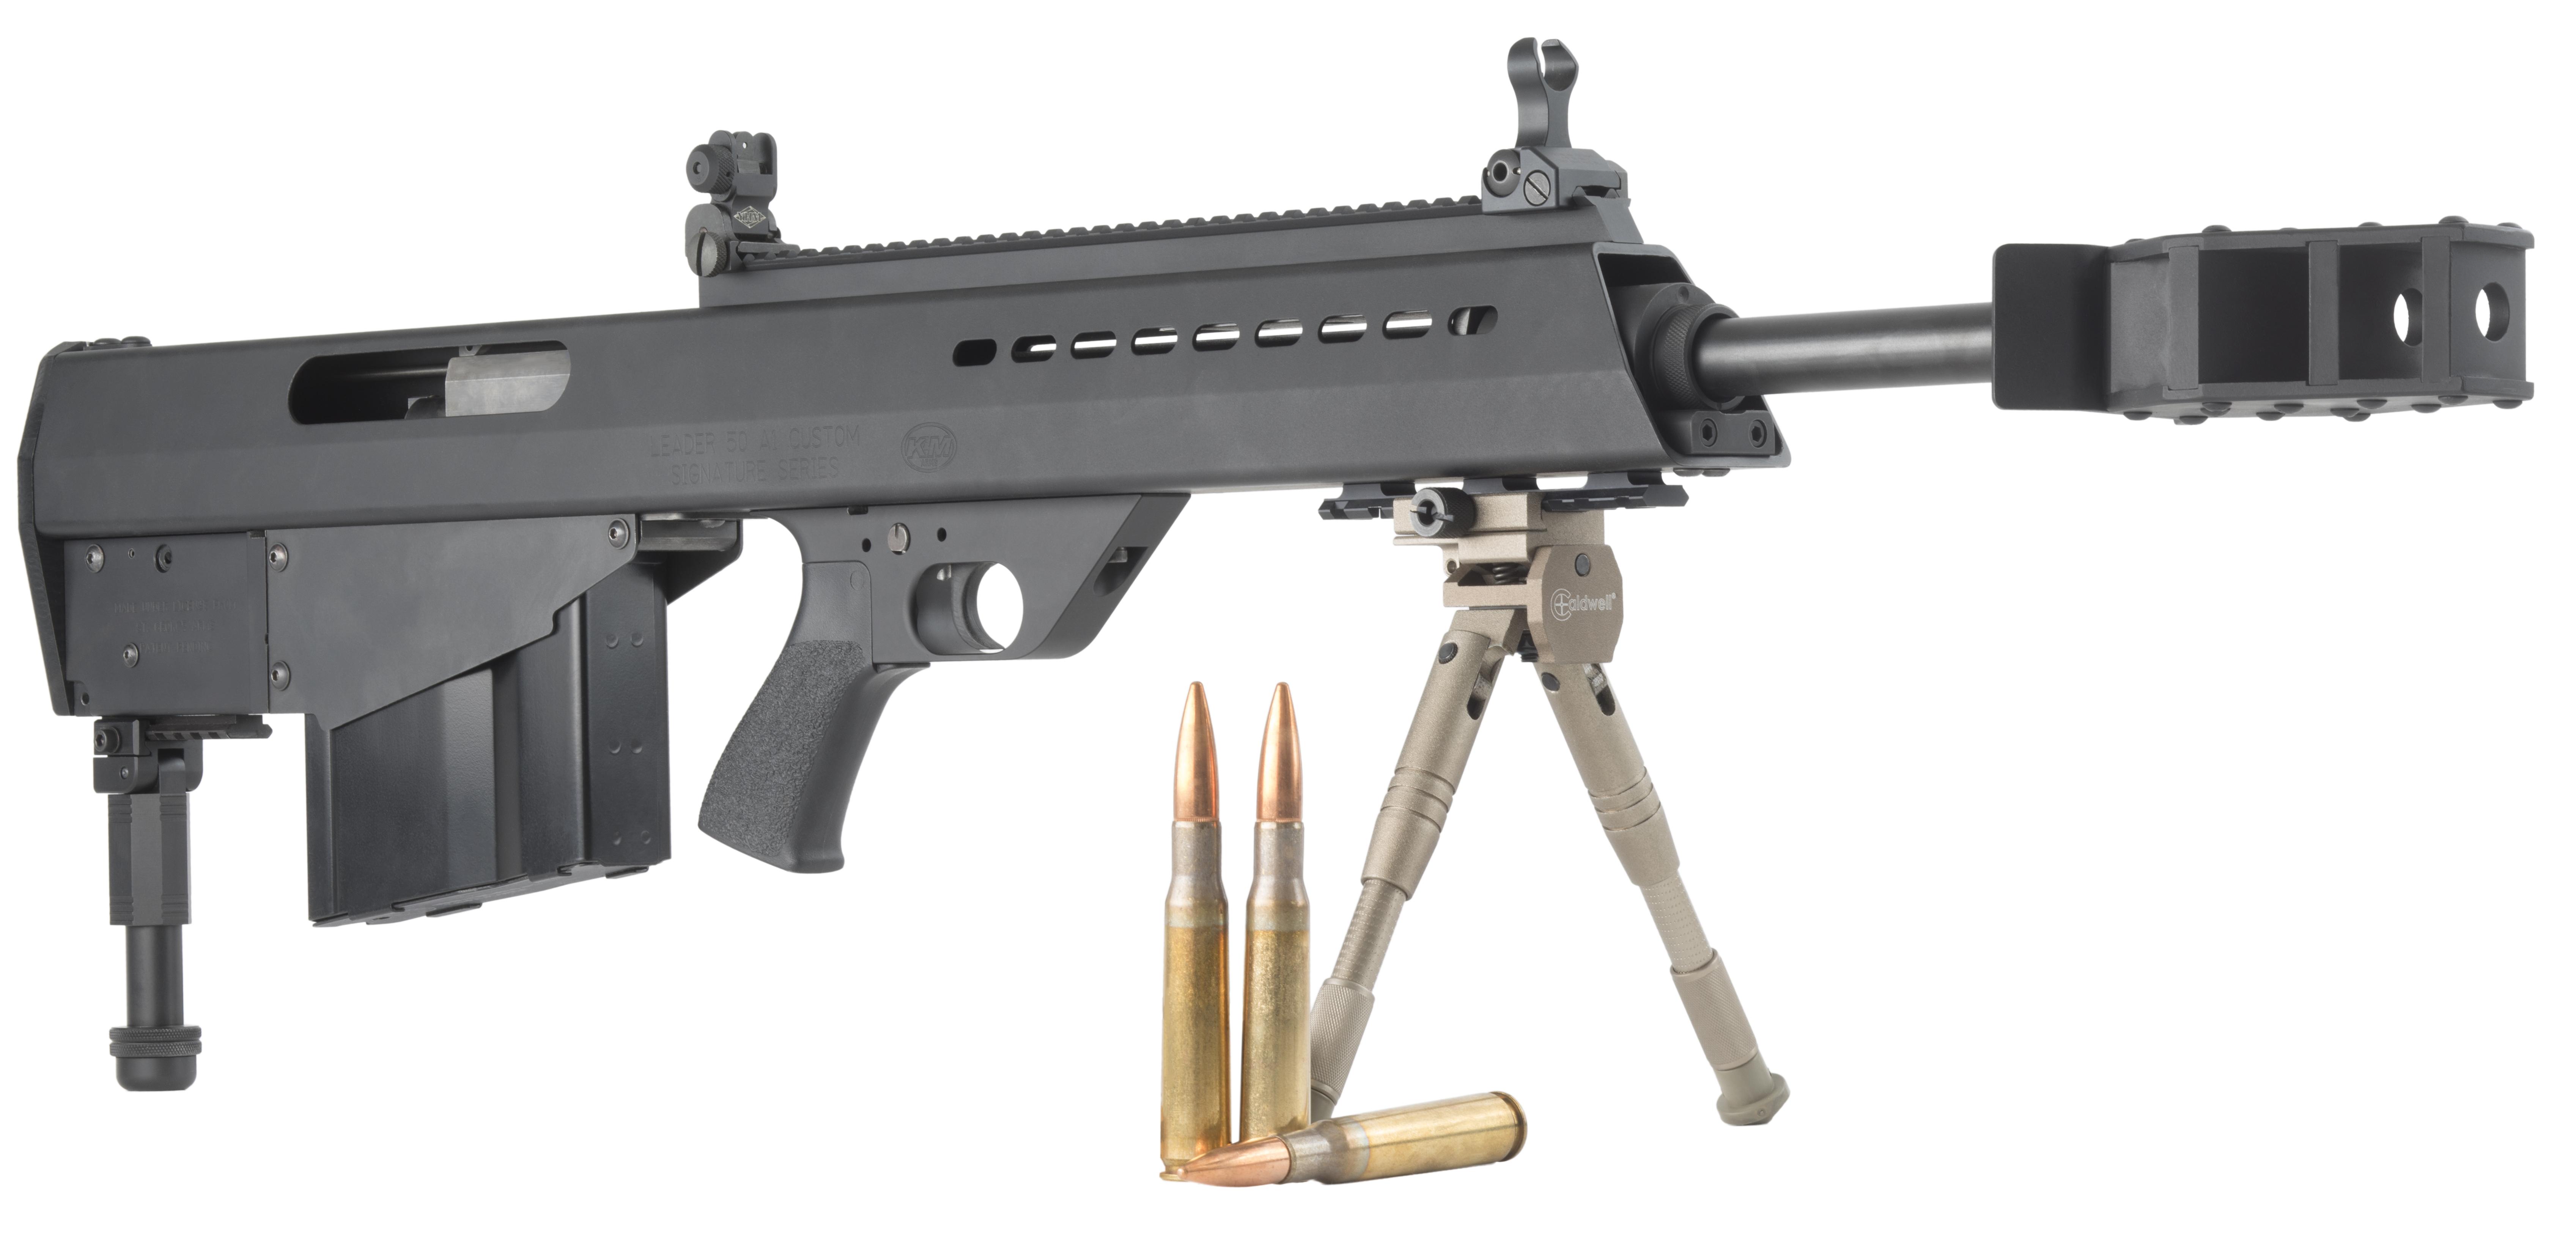 Leader_50_A1_cartridges